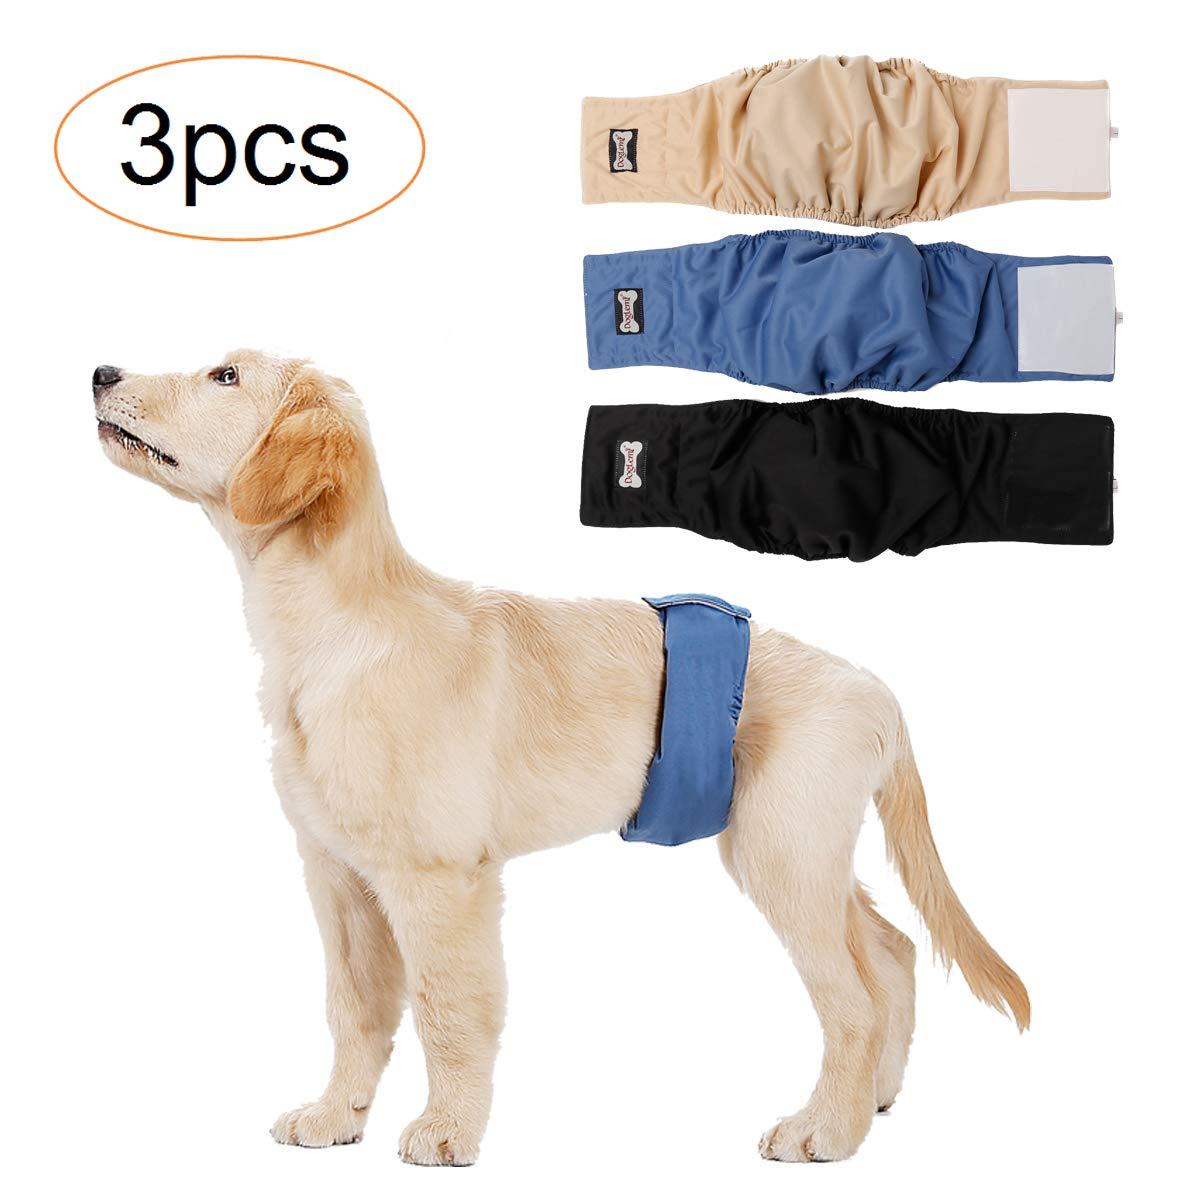 Tineer再利用可能なおむつを防水雄犬の子犬が小さい/ M用ラップおむつを円周/ M 3匹の犬はXLを搭載し